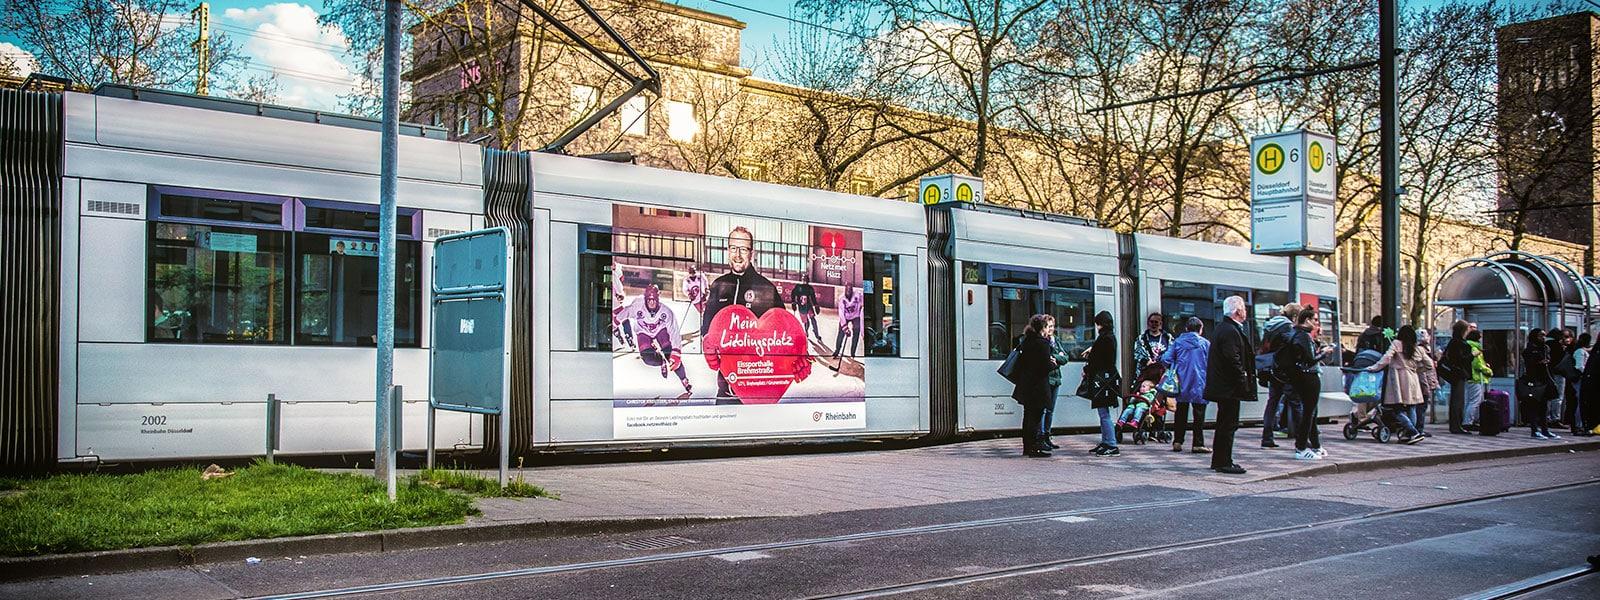 Dortmund-Verkehrsmittelwerbung-Bahn-Traffic-Board